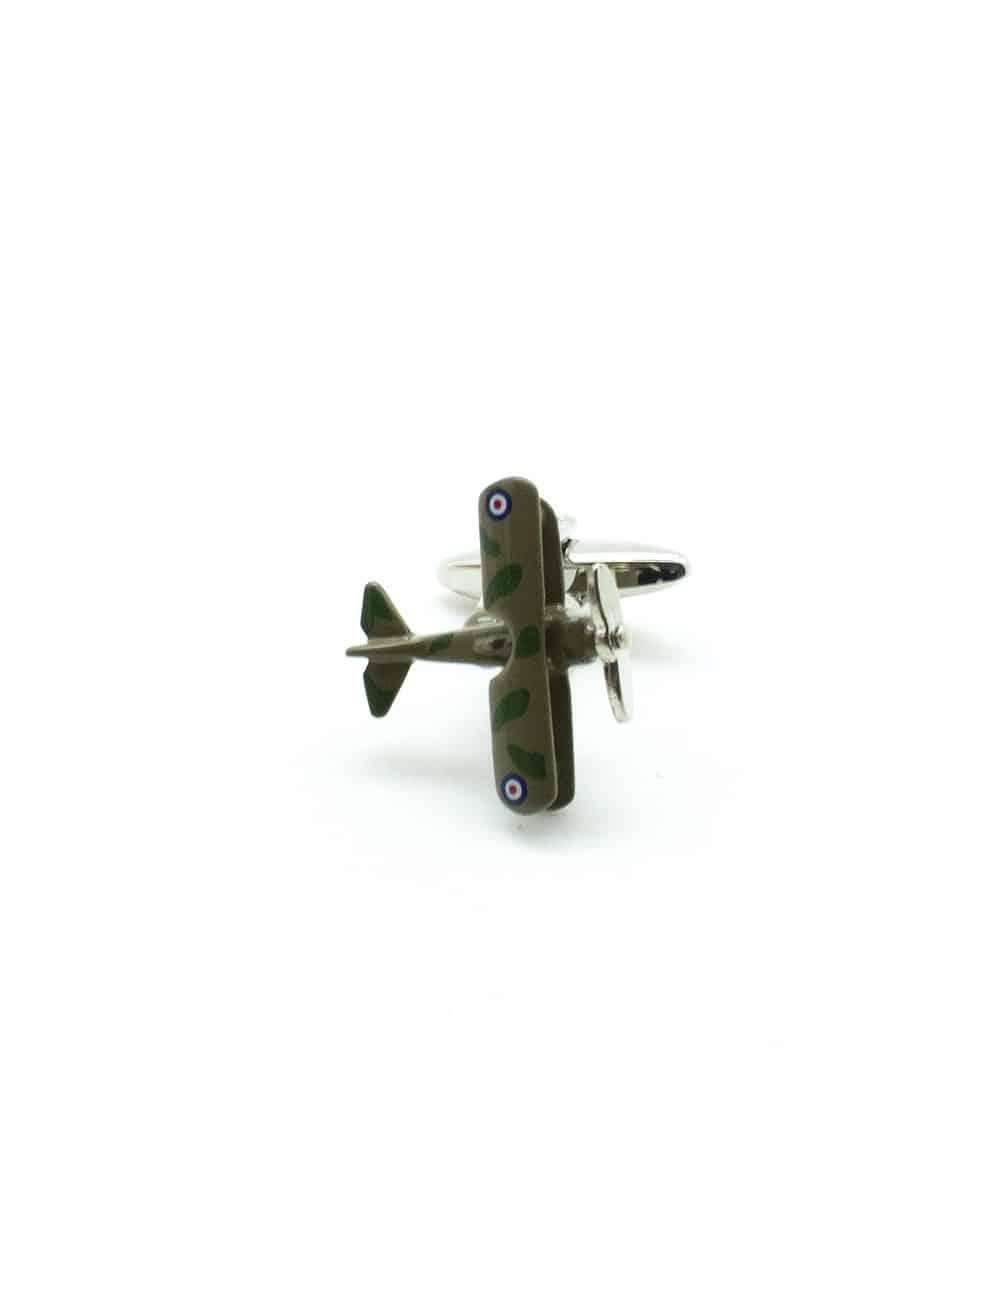 Camo RAF Aircraft Cufflink C271NA-011